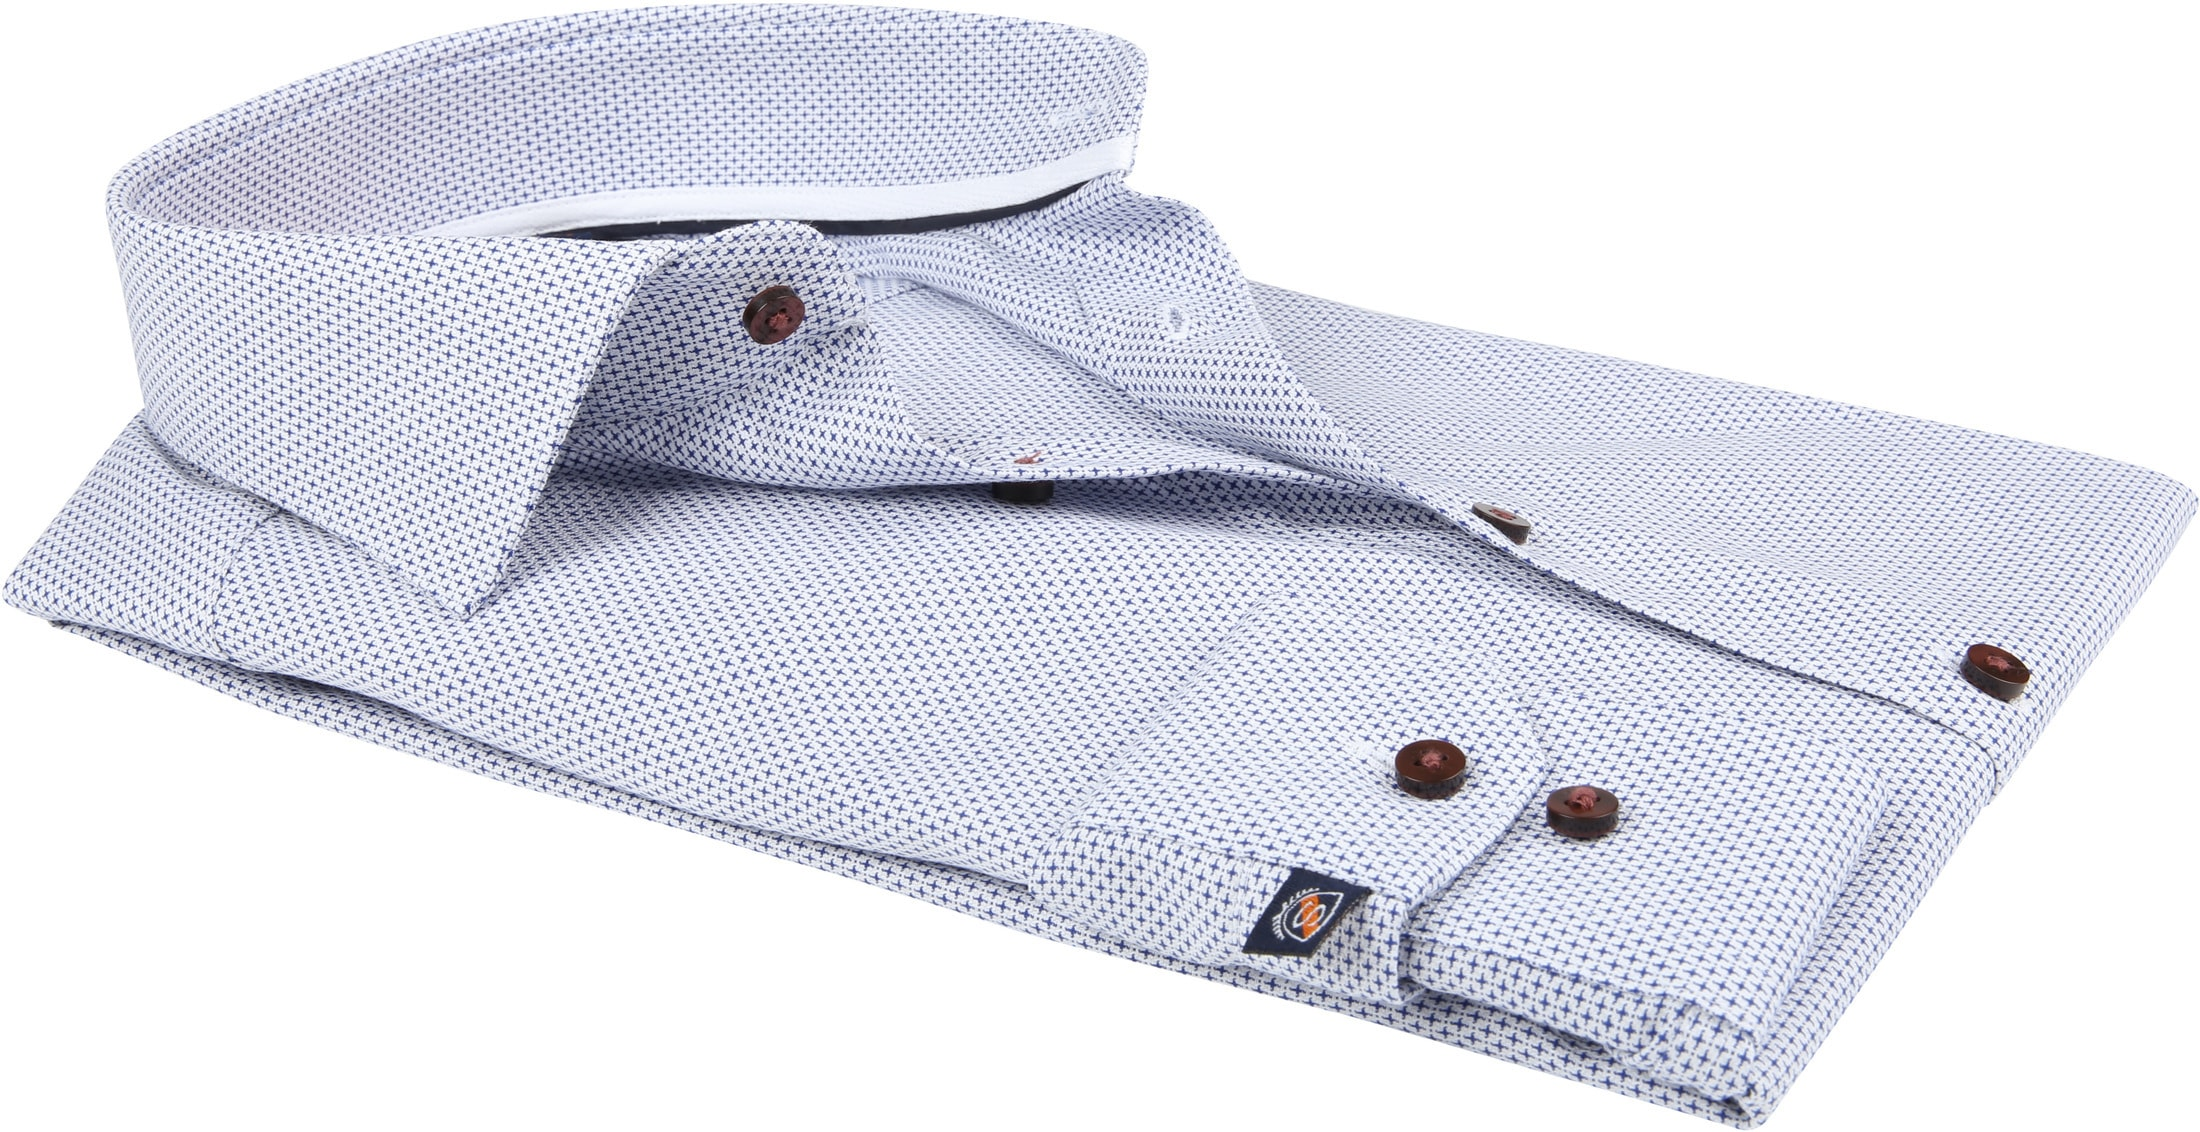 Suitable Overhemd Blauw Dessin D82-20 foto 3